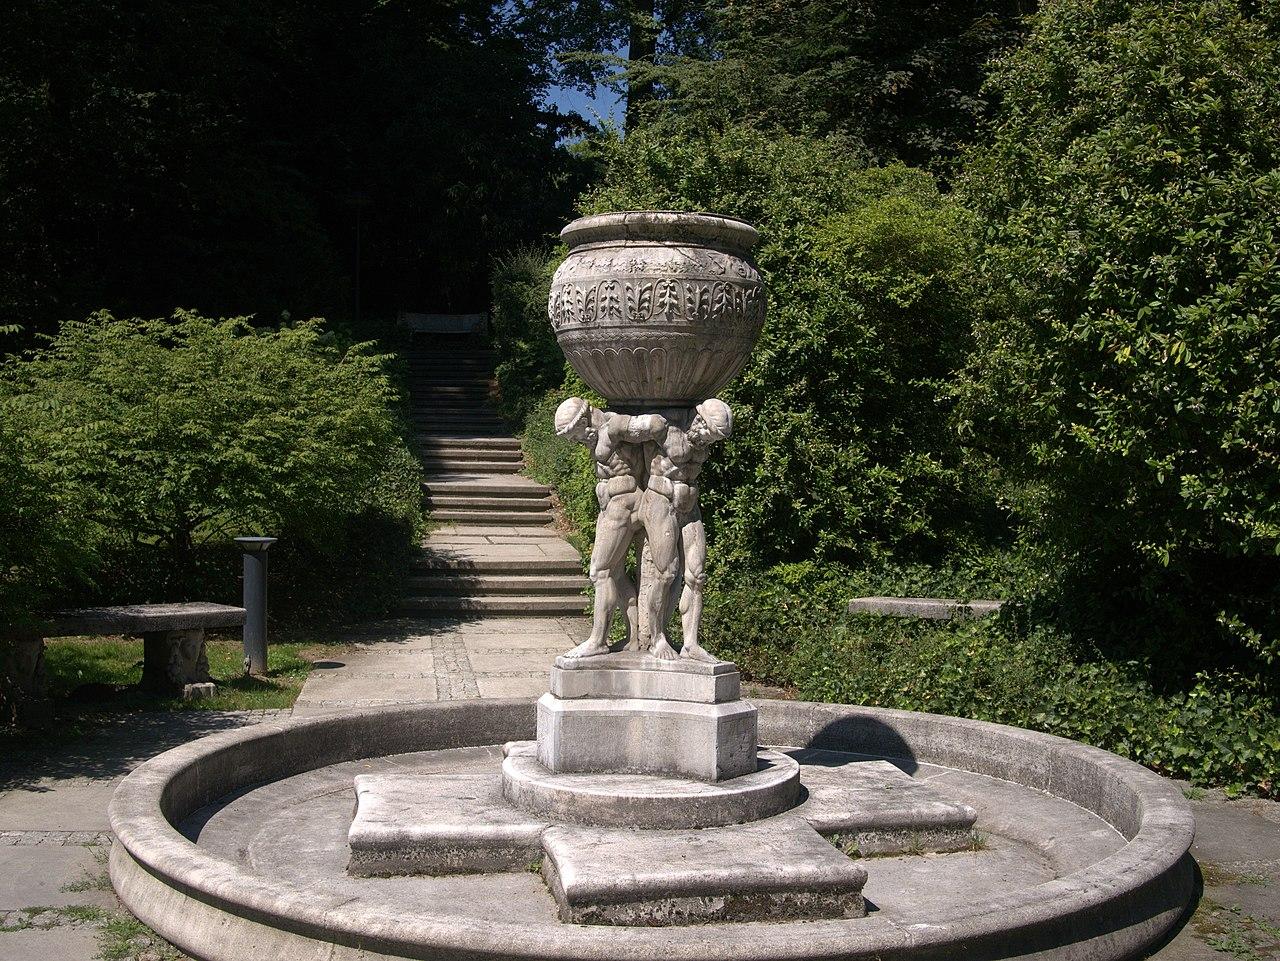 Gartenbau Linz file linz hatschekvilla gartenbaudenkmal 1 jpg wikimedia commons